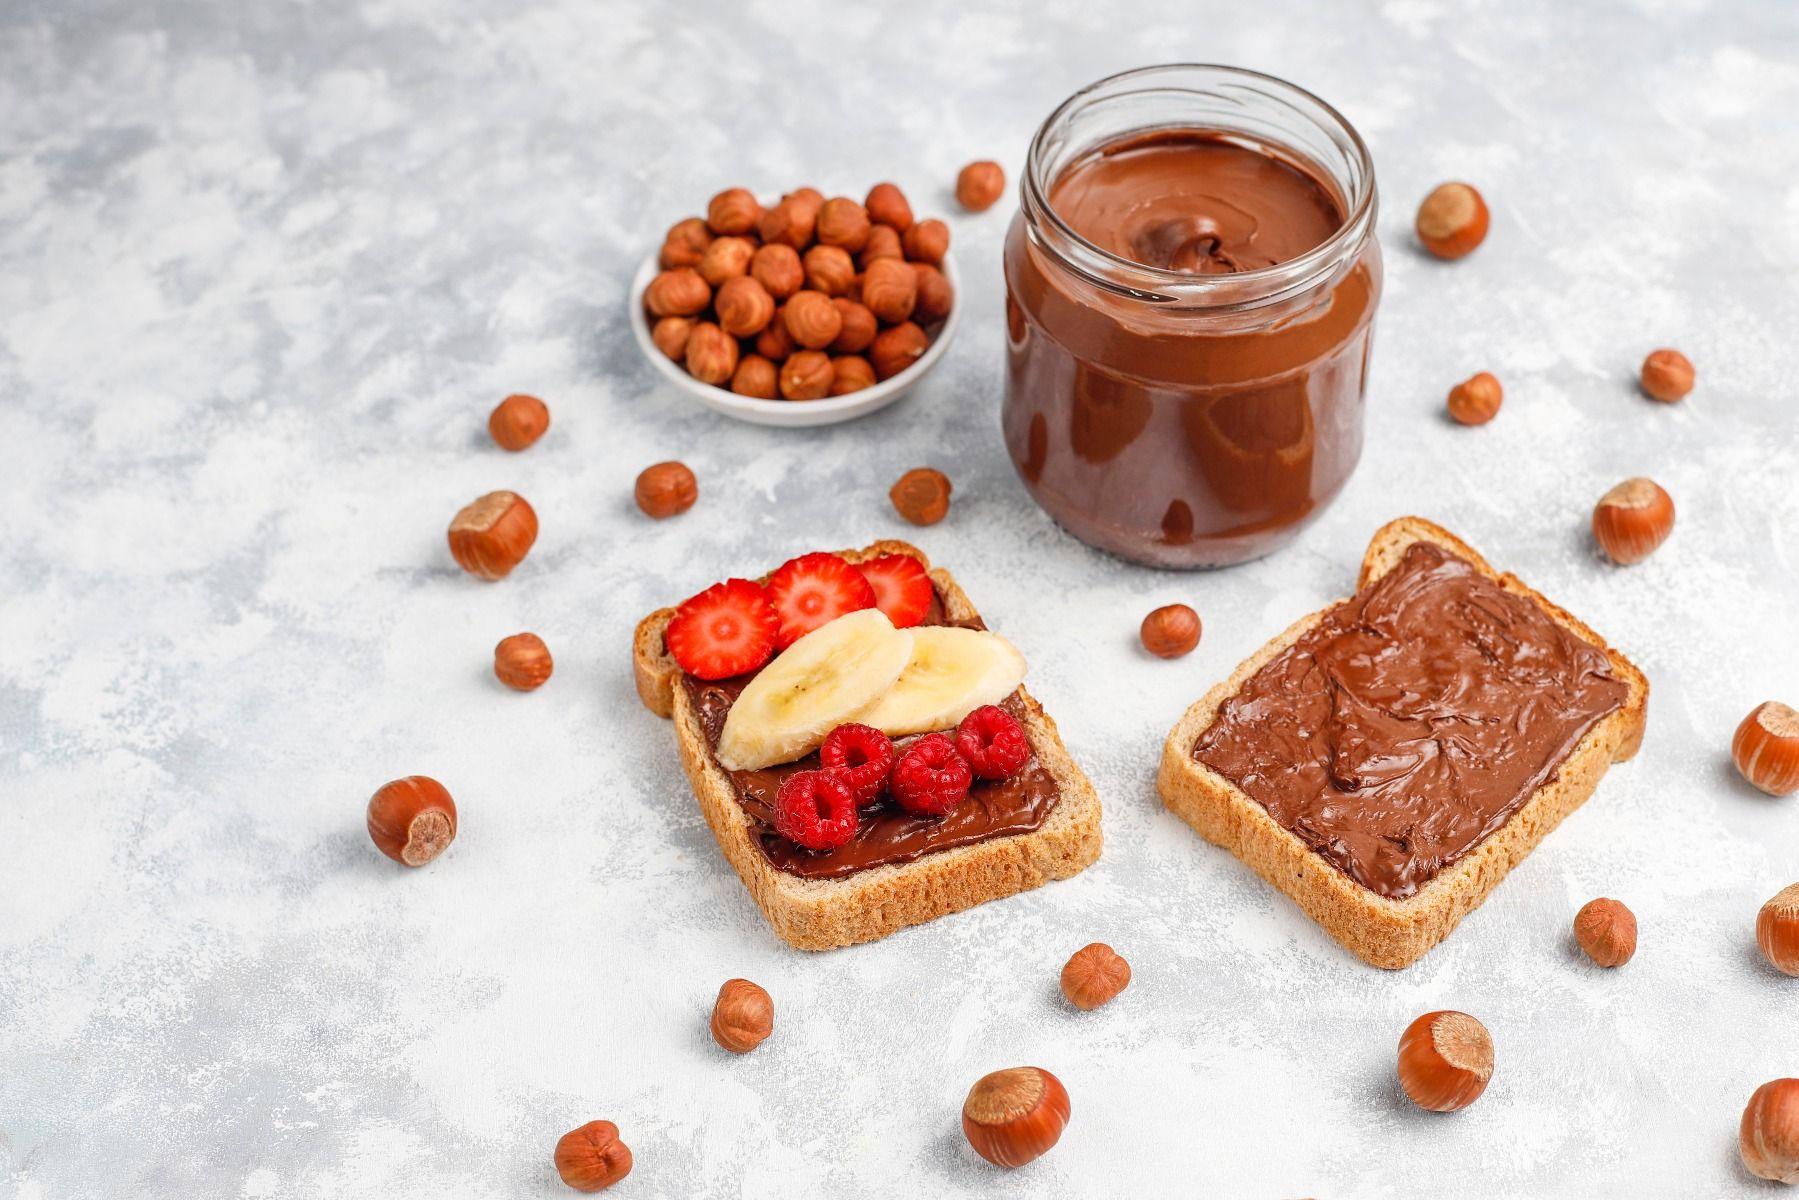 Spread de cocoa sabor avellana